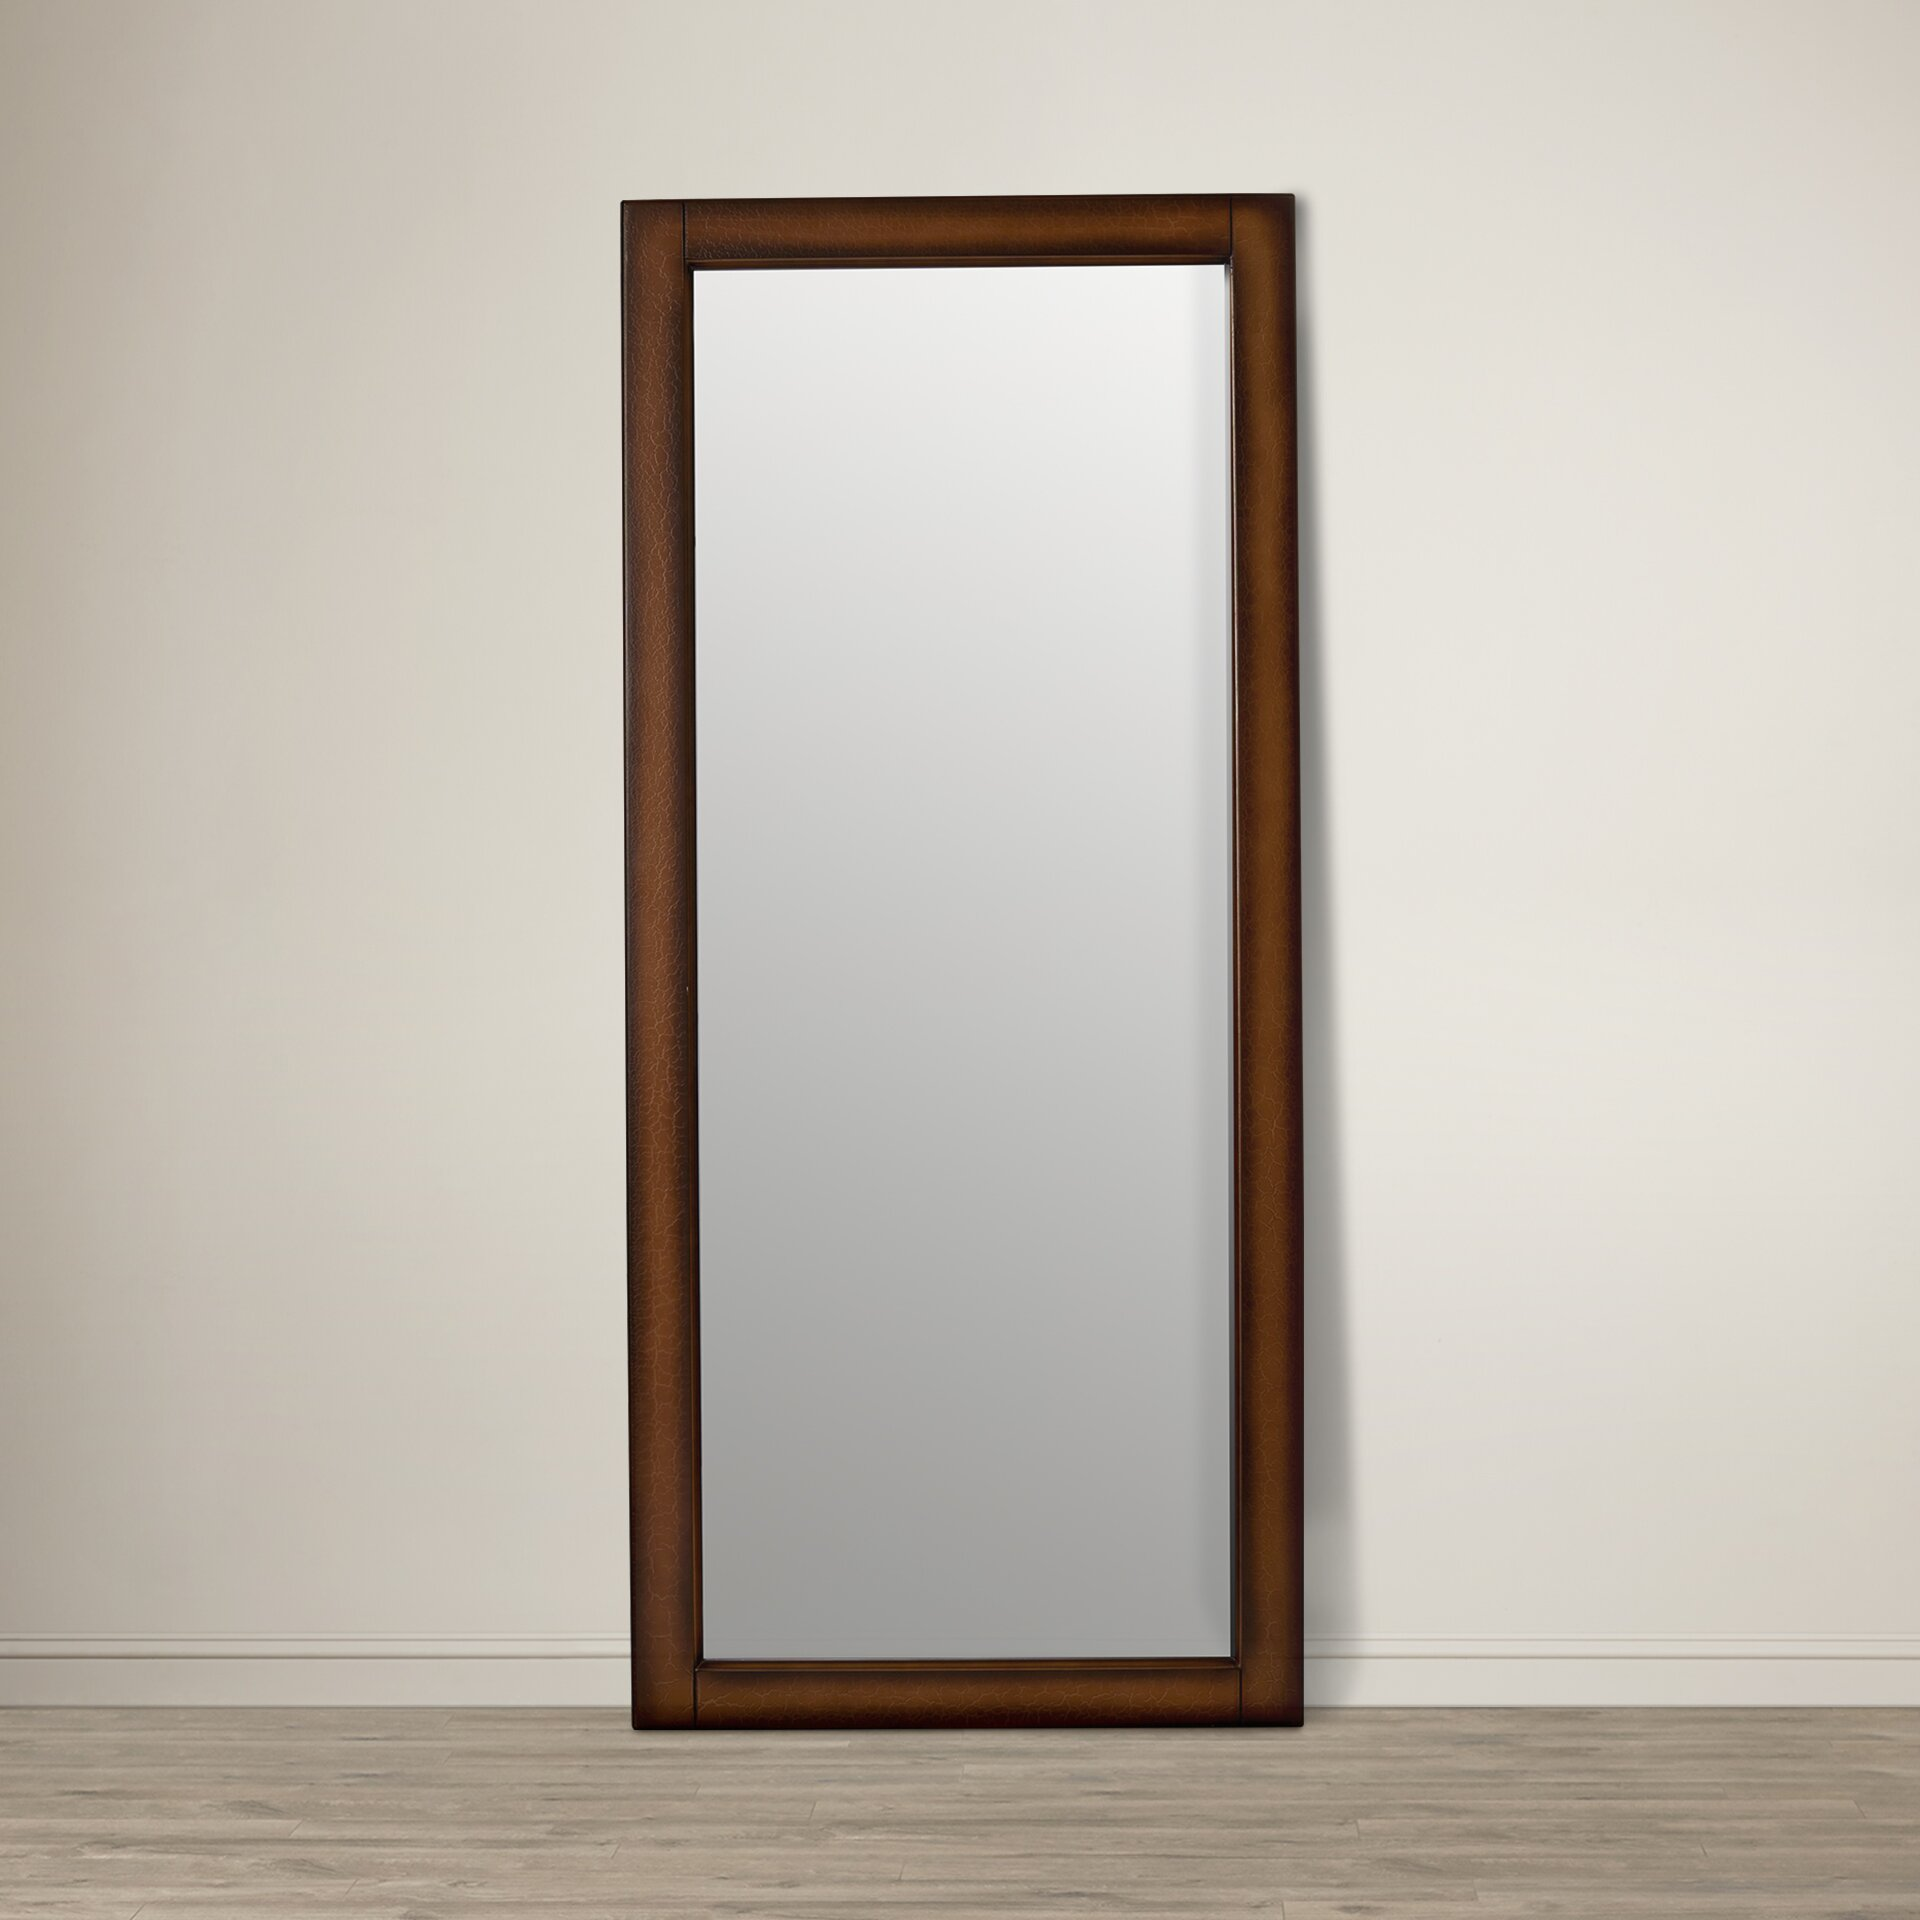 Leaning floor mirrors sale